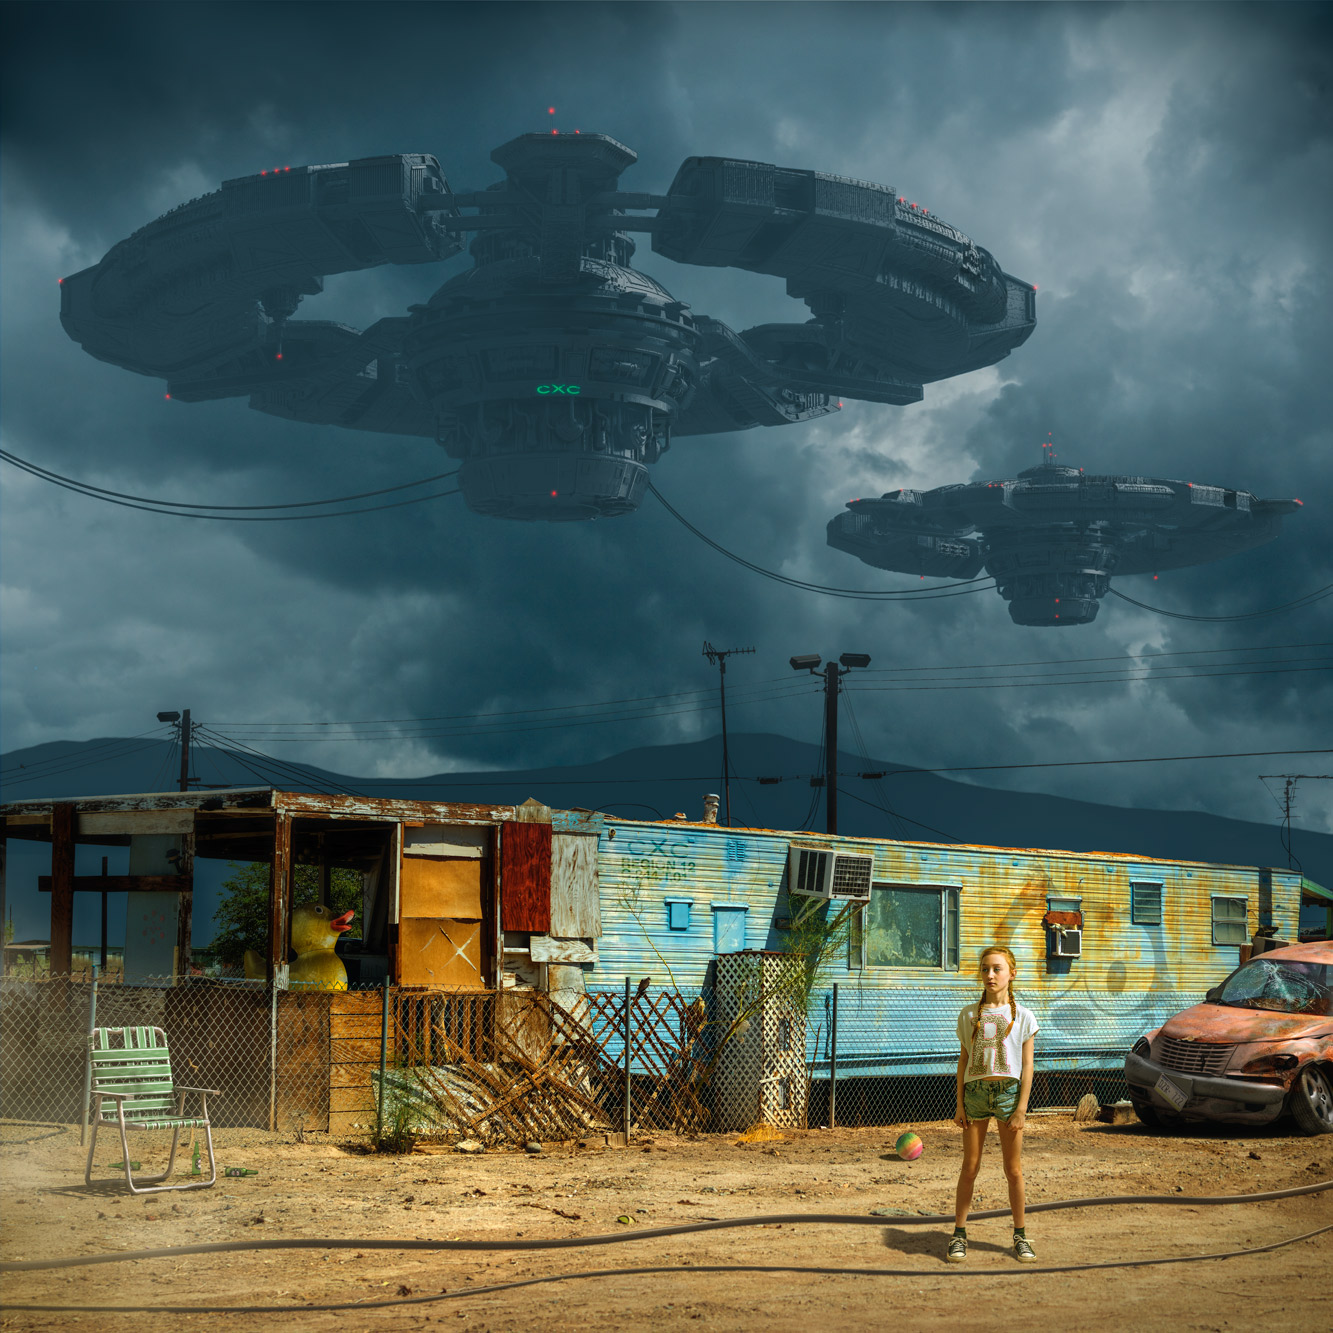 Chris Clor space ships